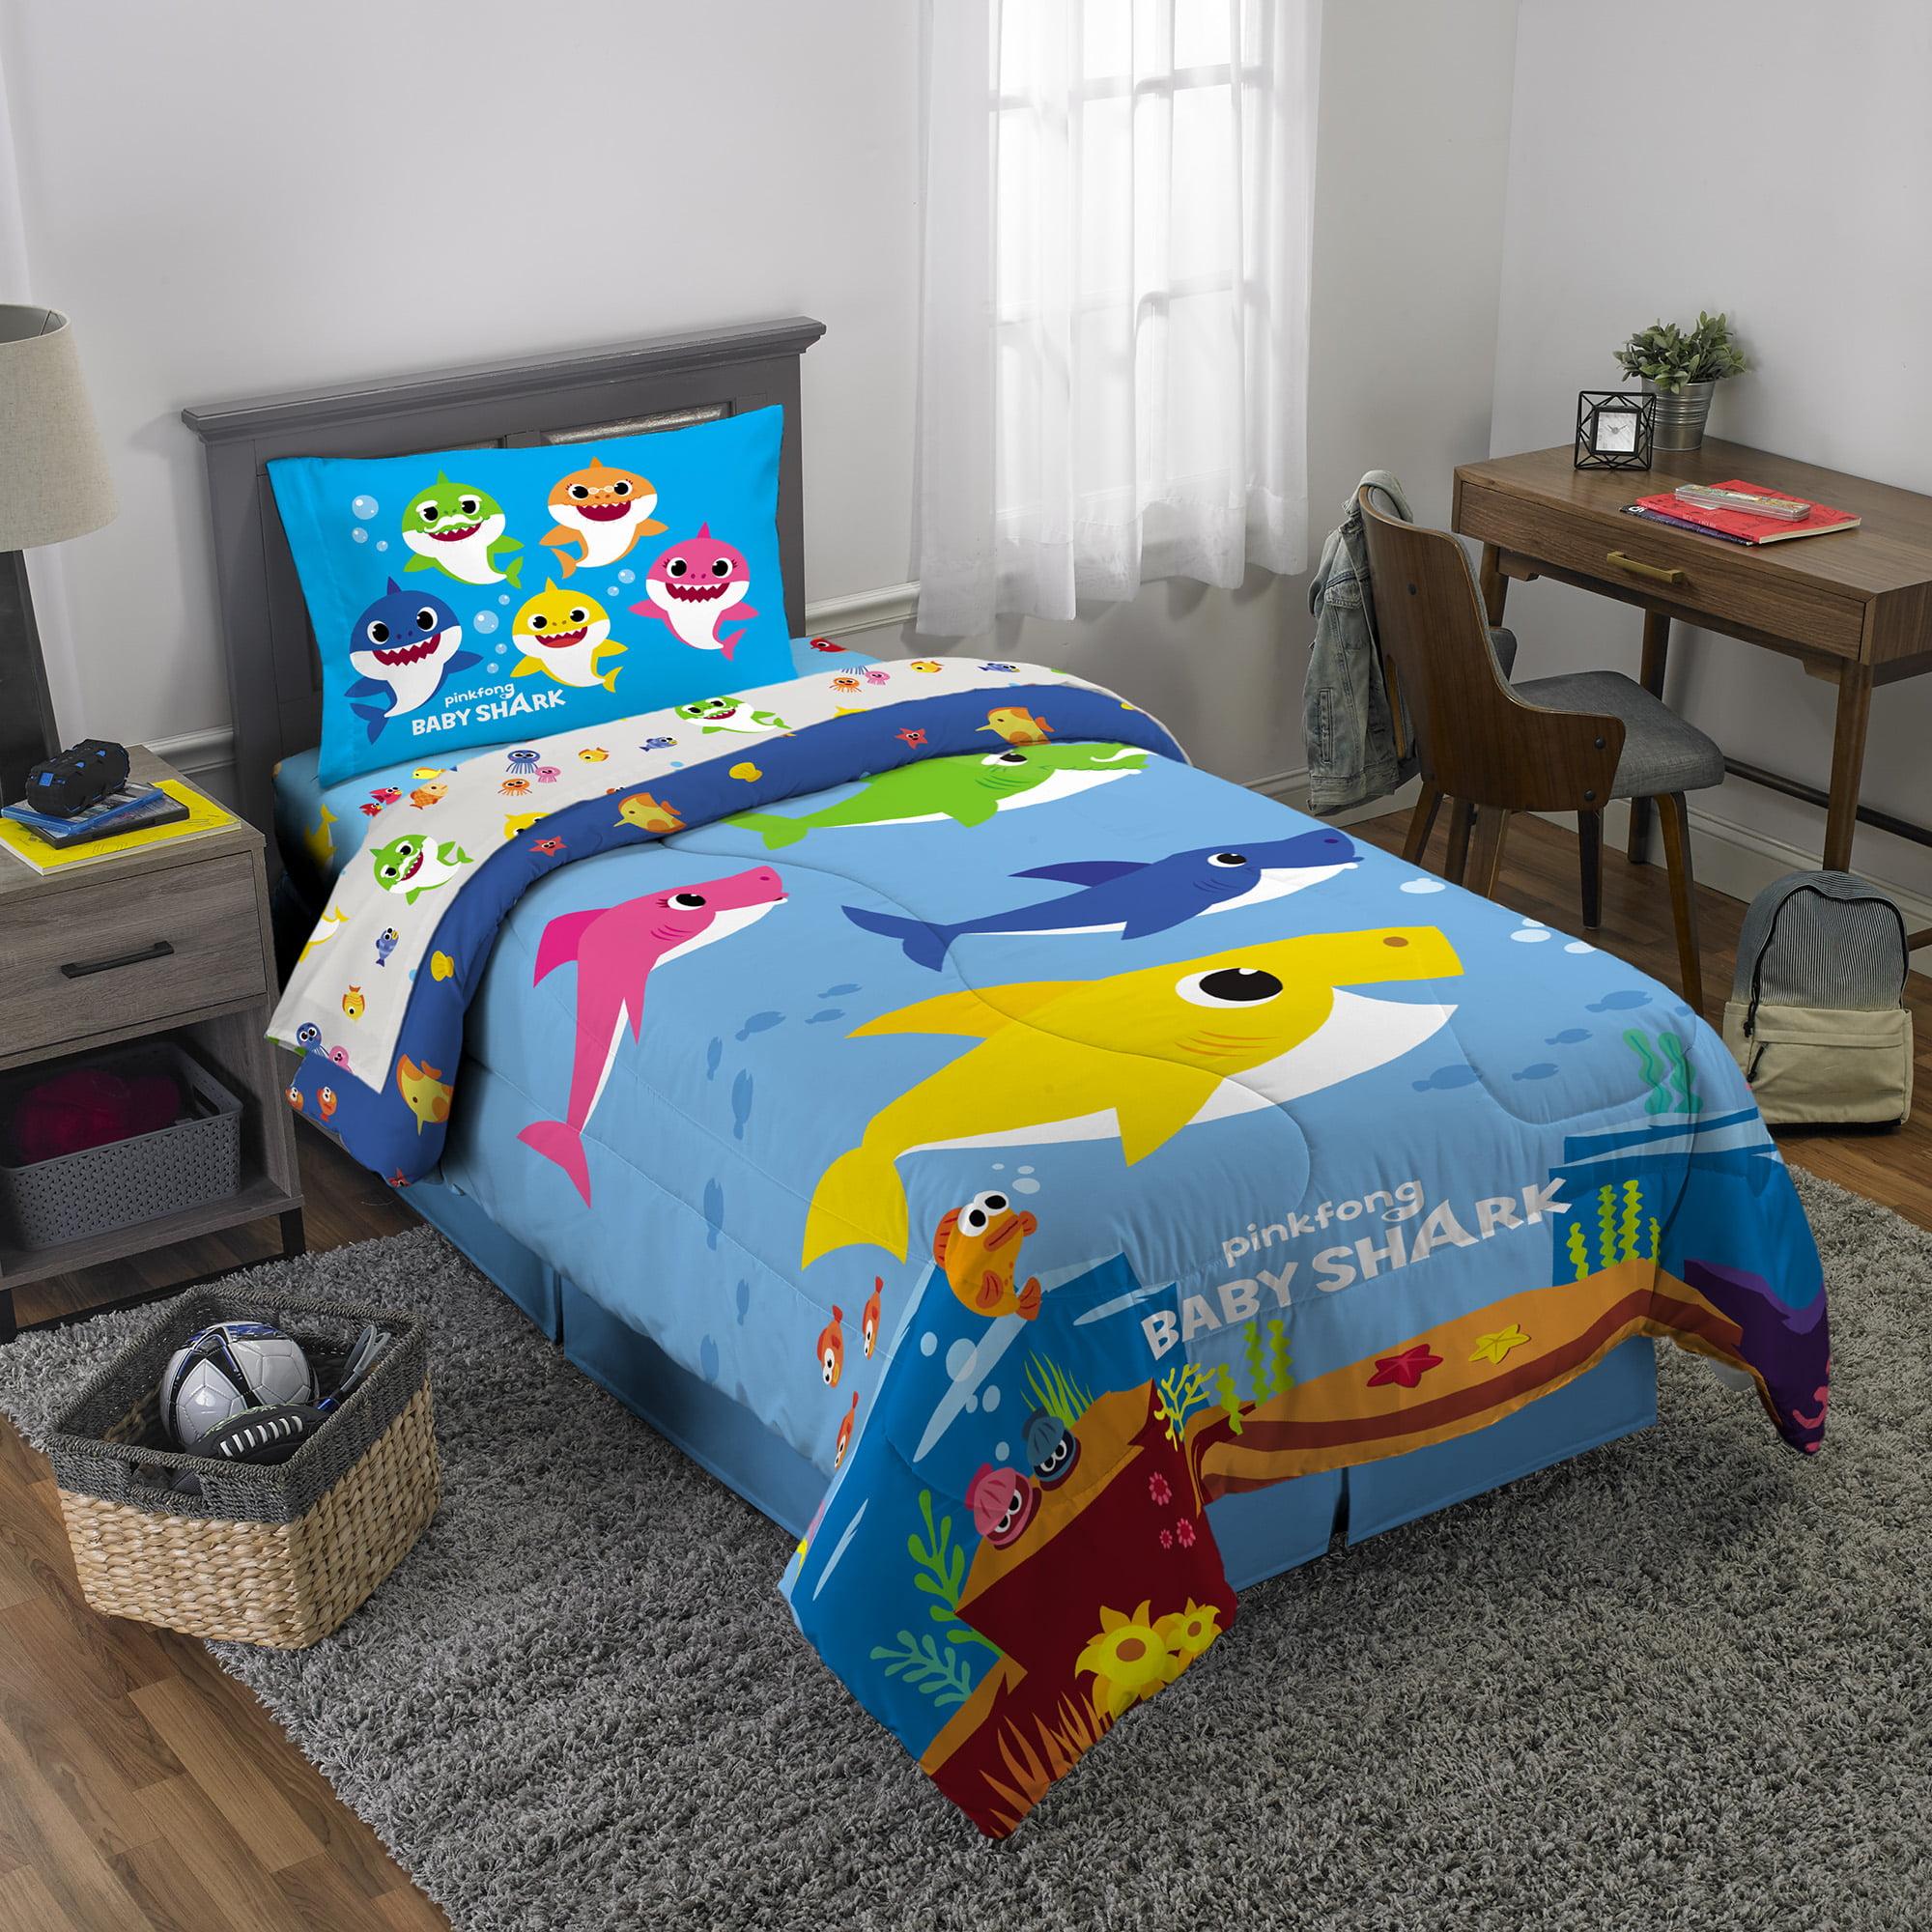 New Born Gift Personalised Pirate Fairy Princess Comforter Comfort blanket